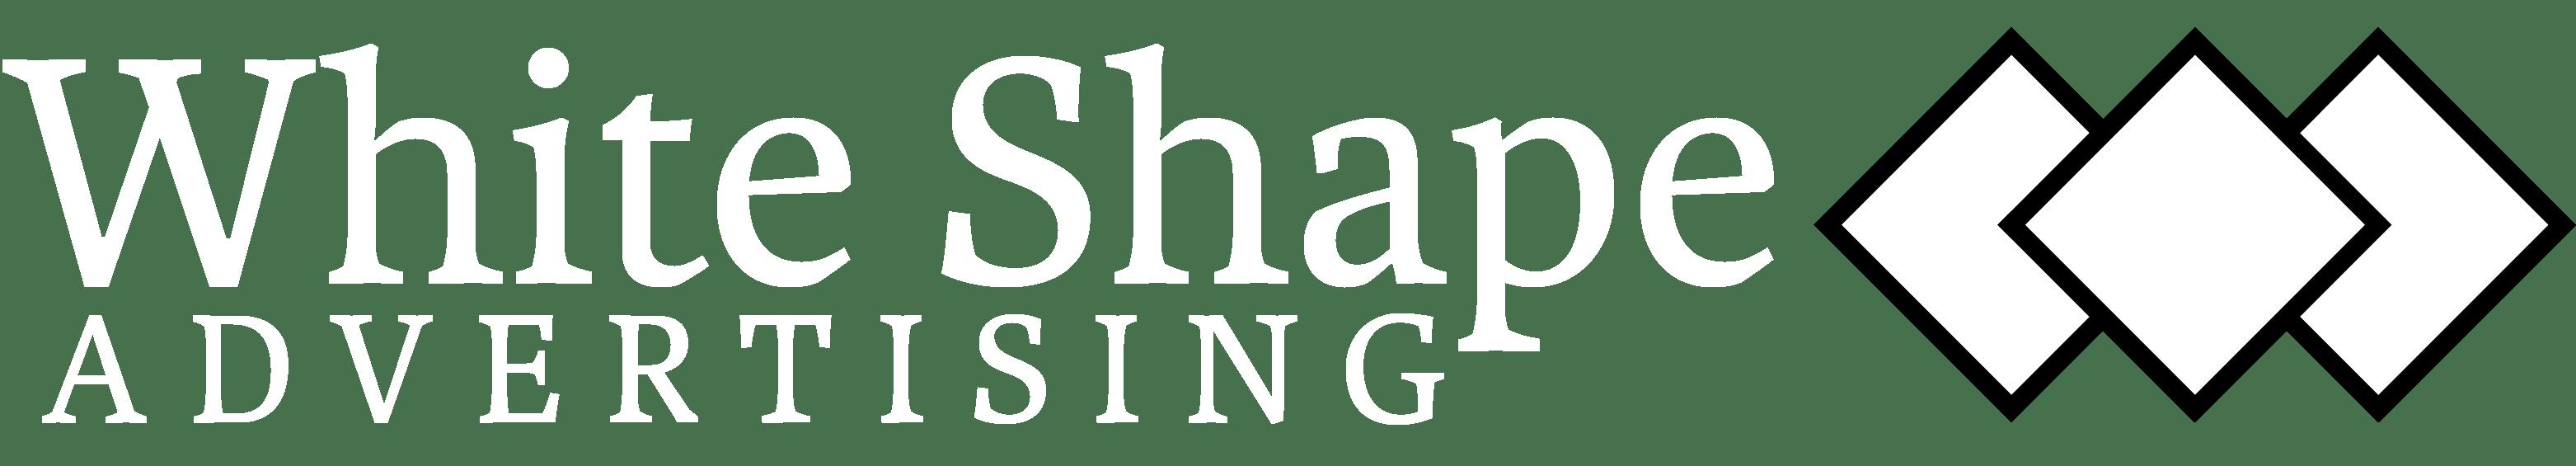 Whiteshape Advertising